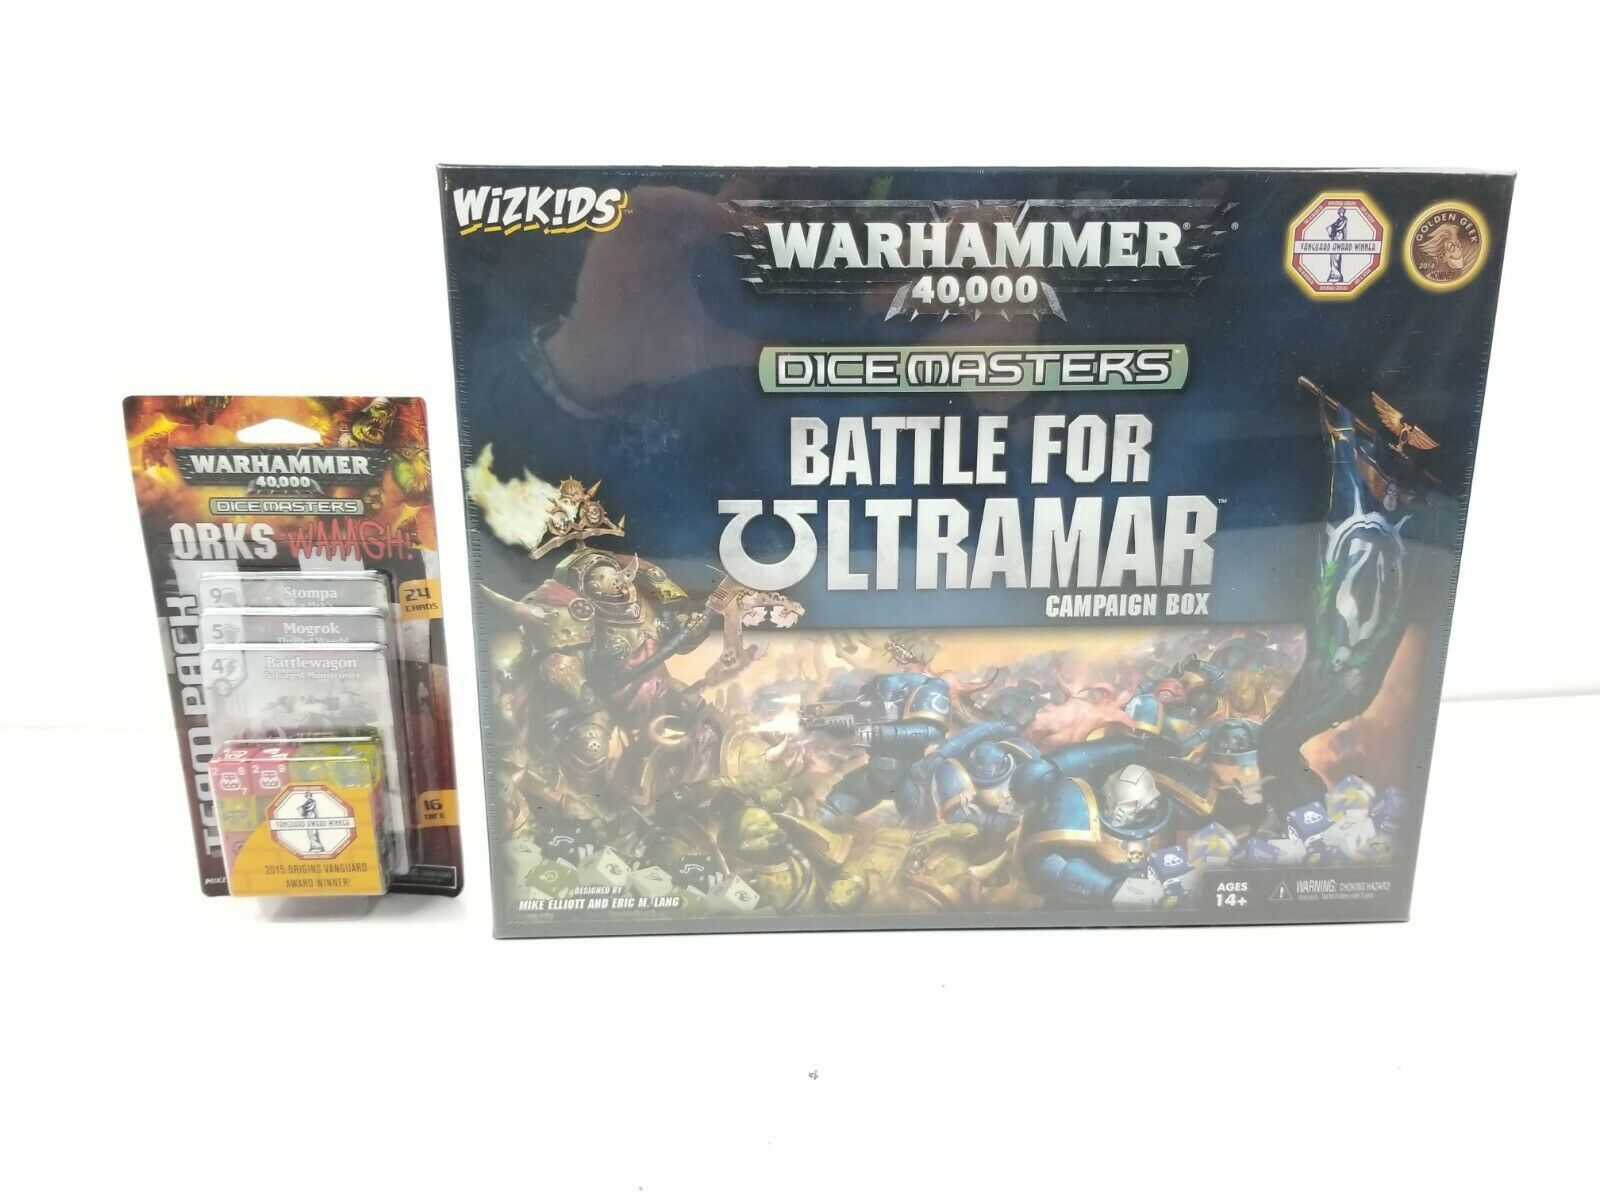 Warhammer 40,000 Dice Masters Battle for Ultramar & Orks WAAAGH! New BUNDLE - $34.95